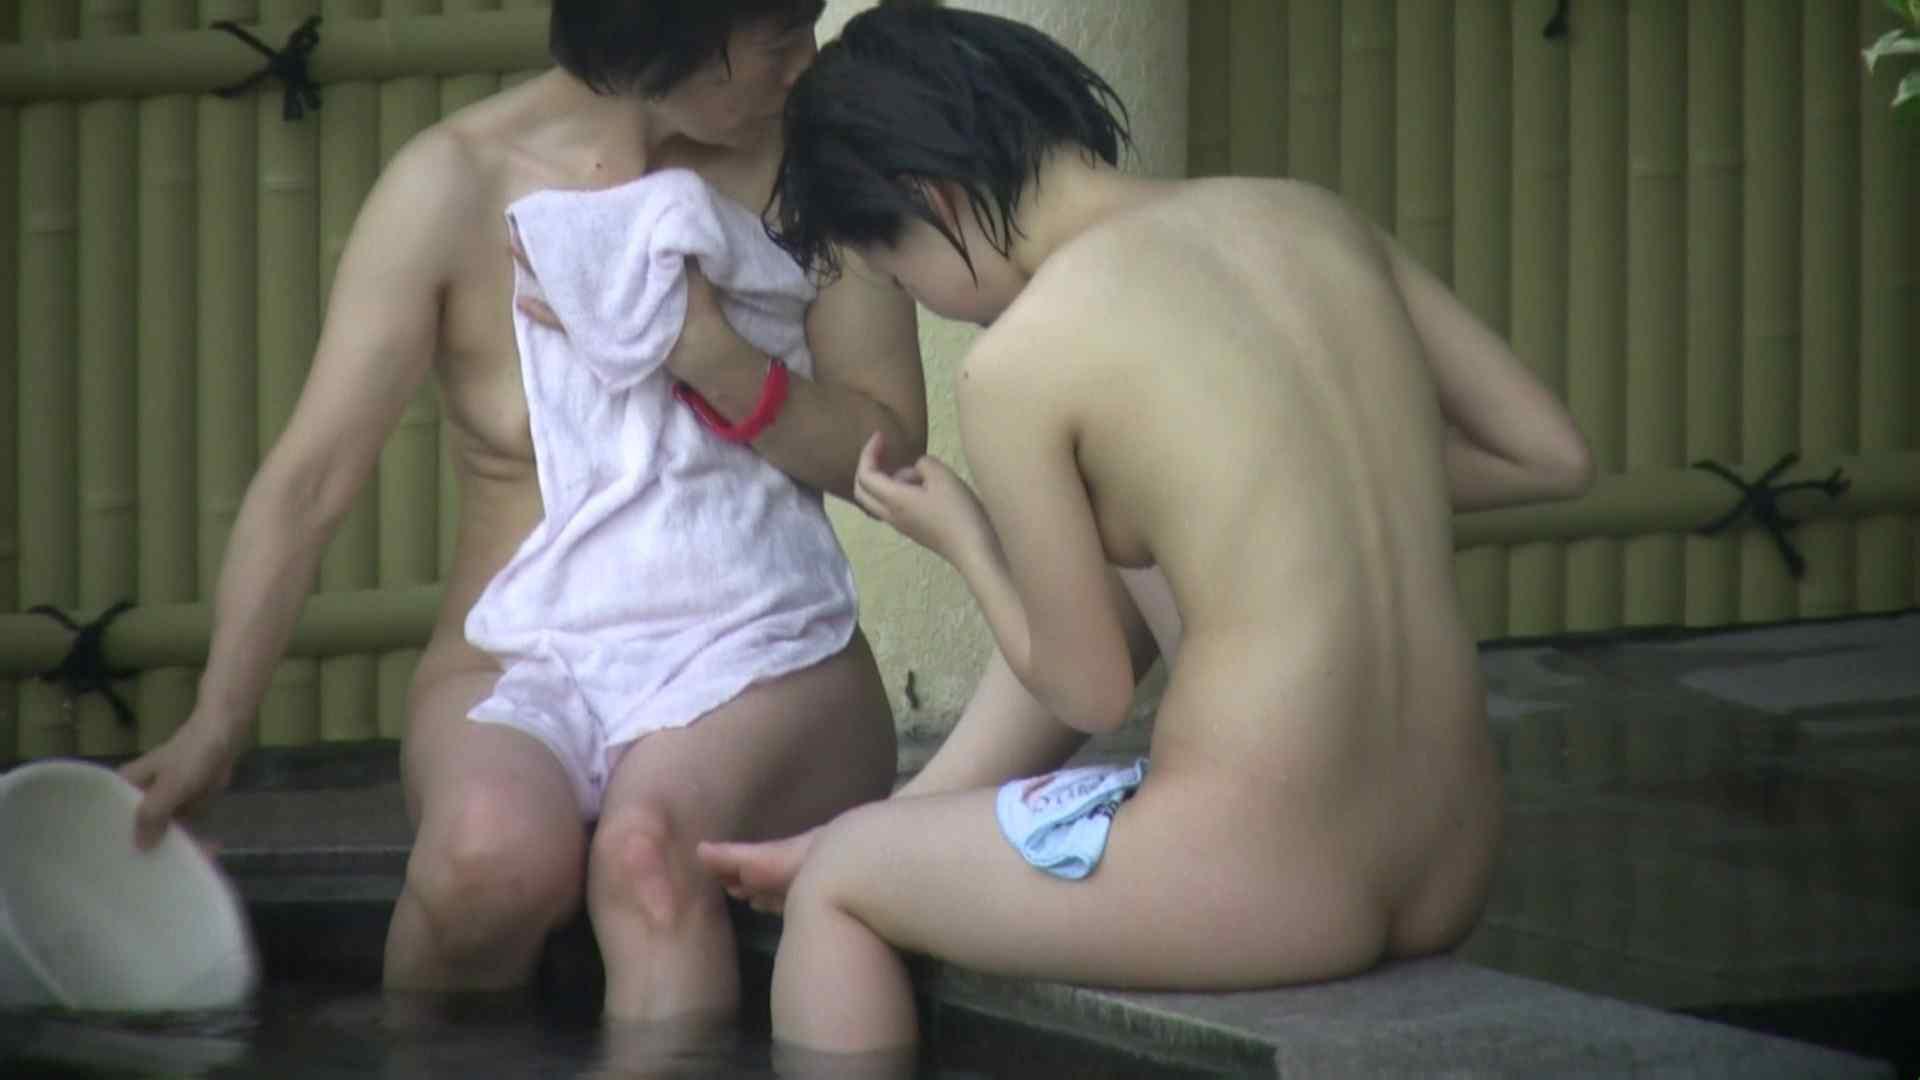 Aquaな露天風呂Vol.06【VIP】 盗撮大放出 ヌード画像 96連発 63